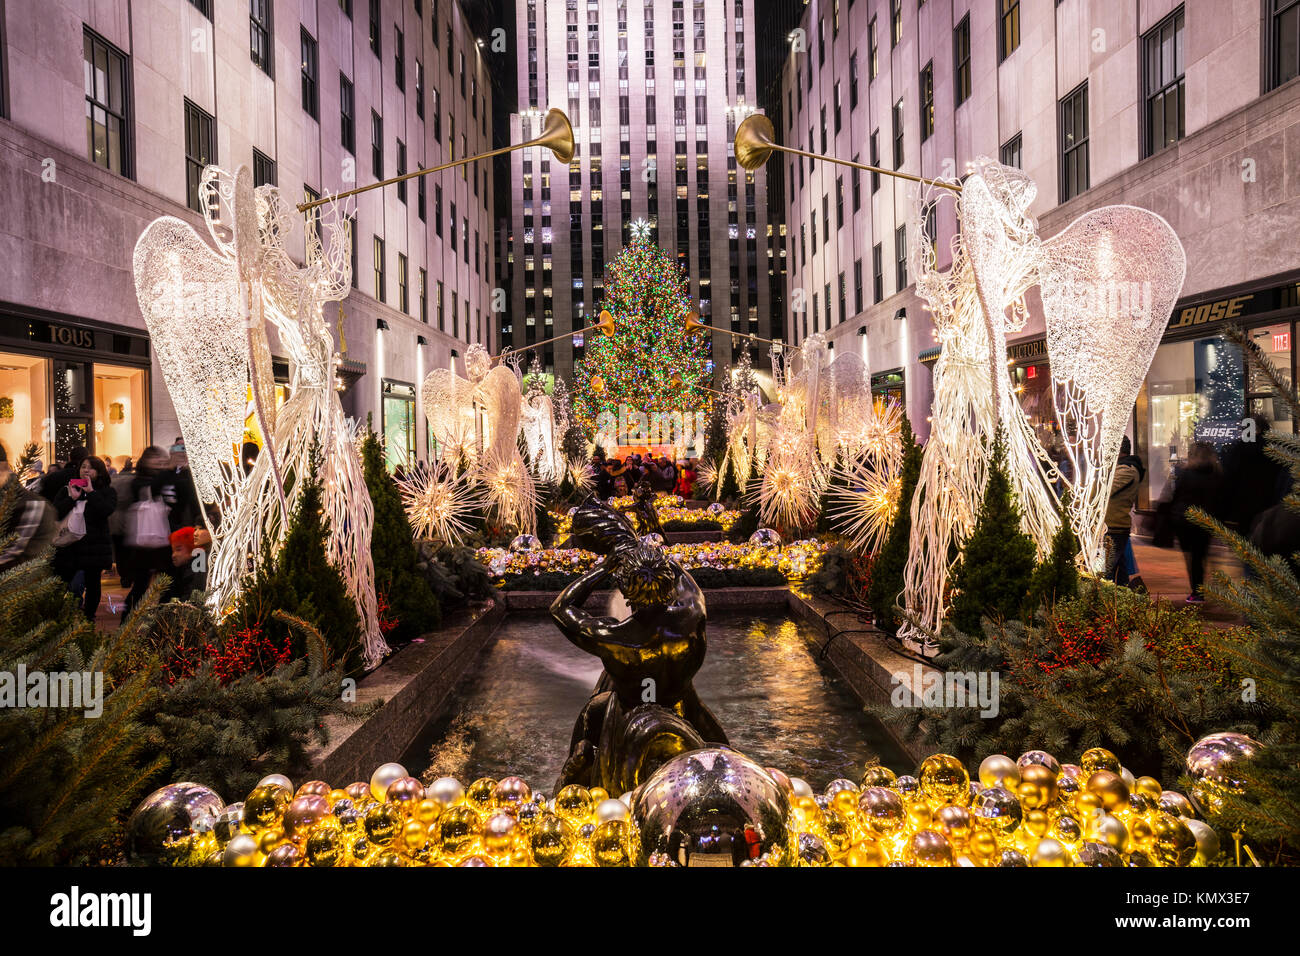 Downtown New York Christmas Decorations Stock Photos